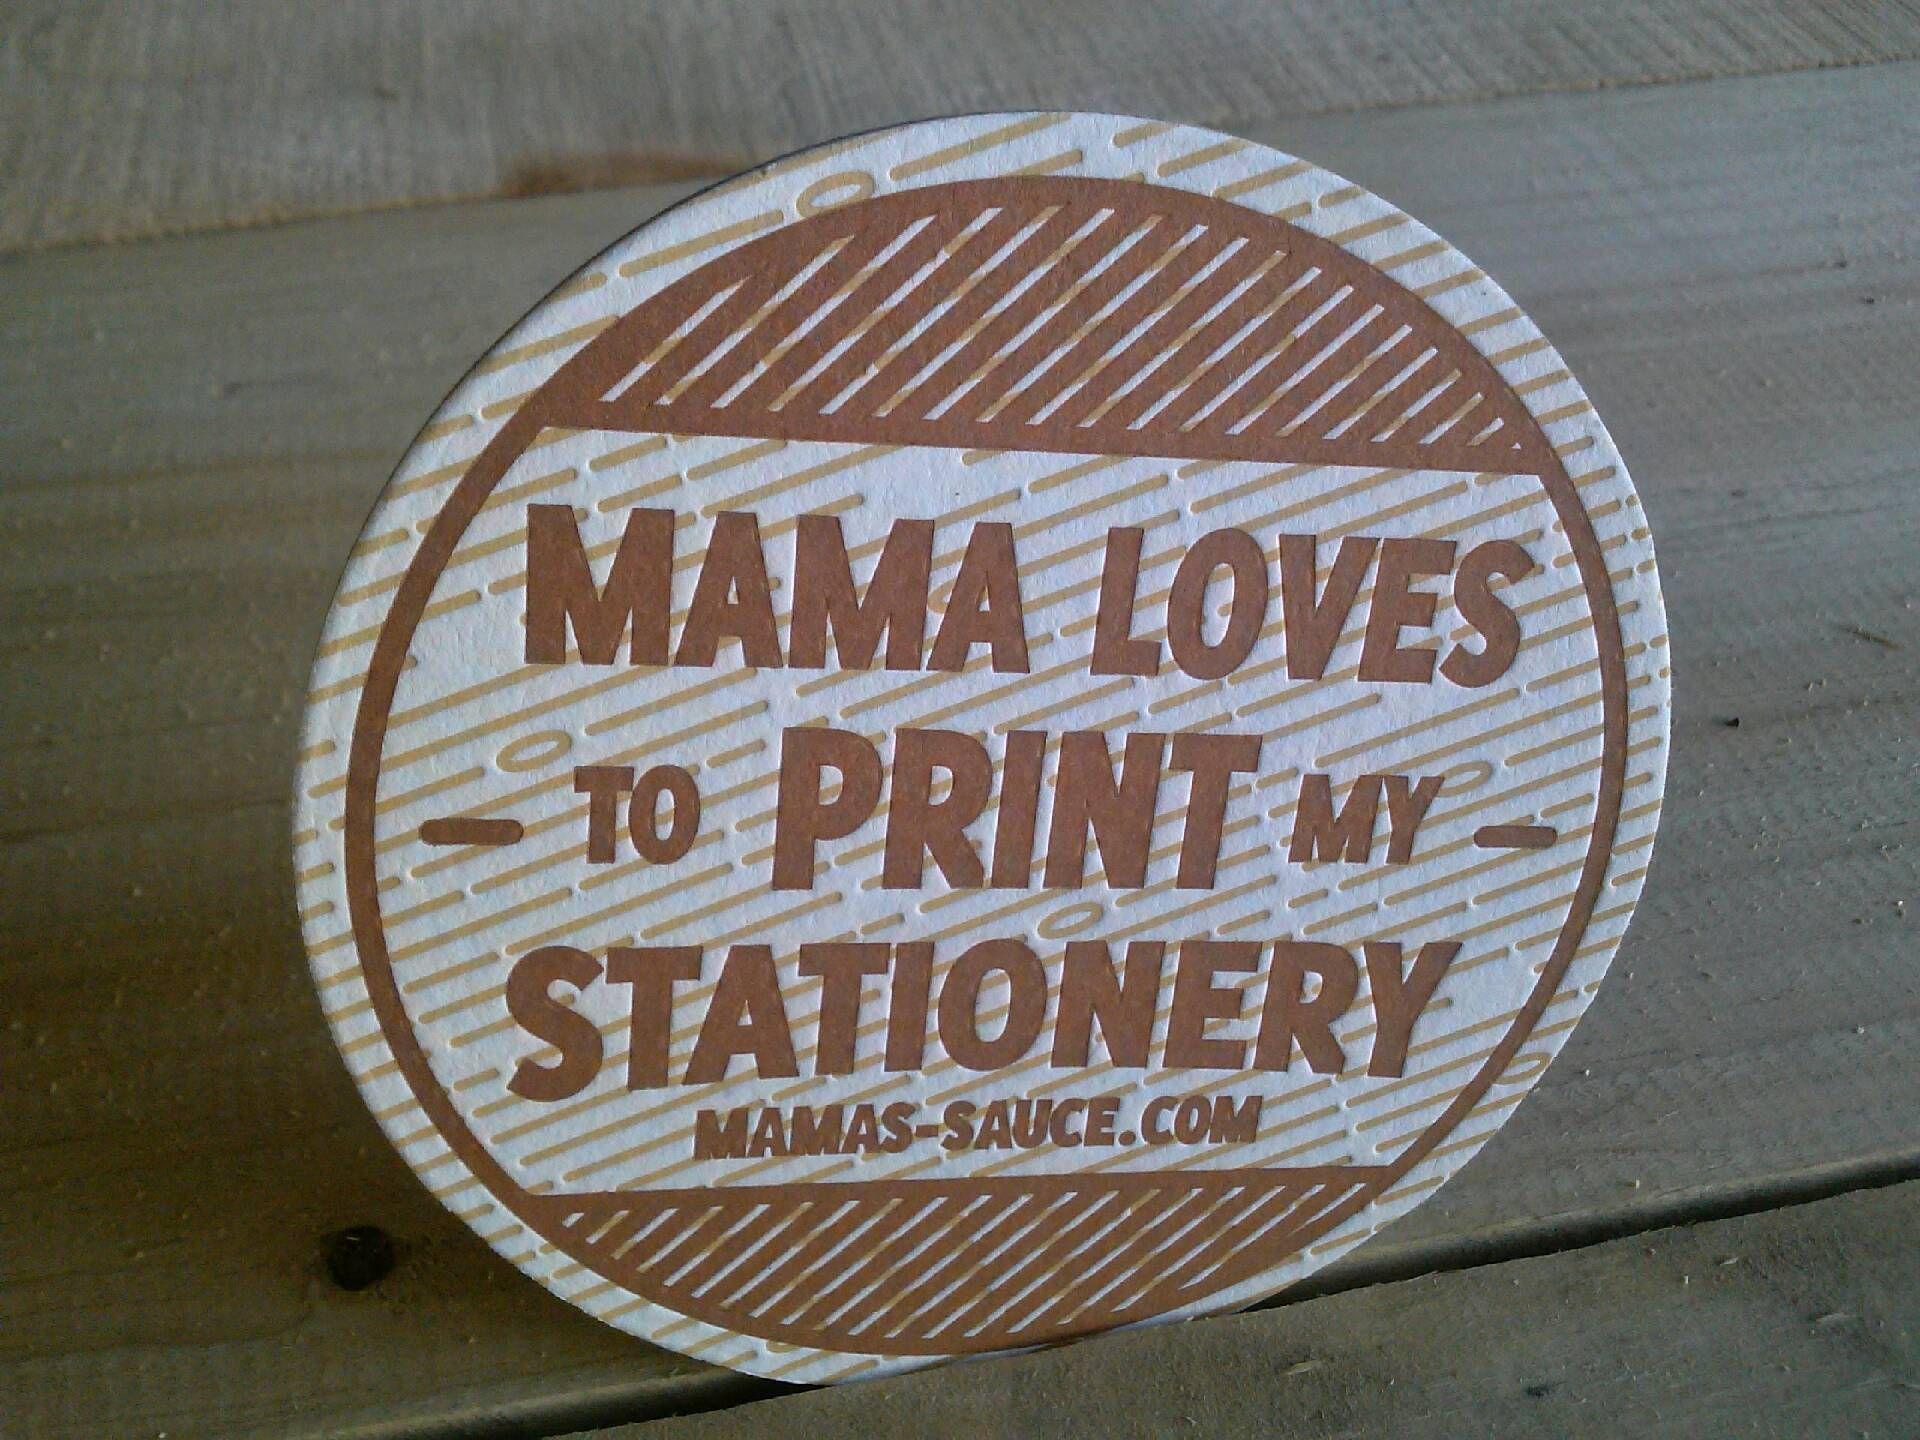 Deep impression plus appealing design by Mamas-Sauce.com